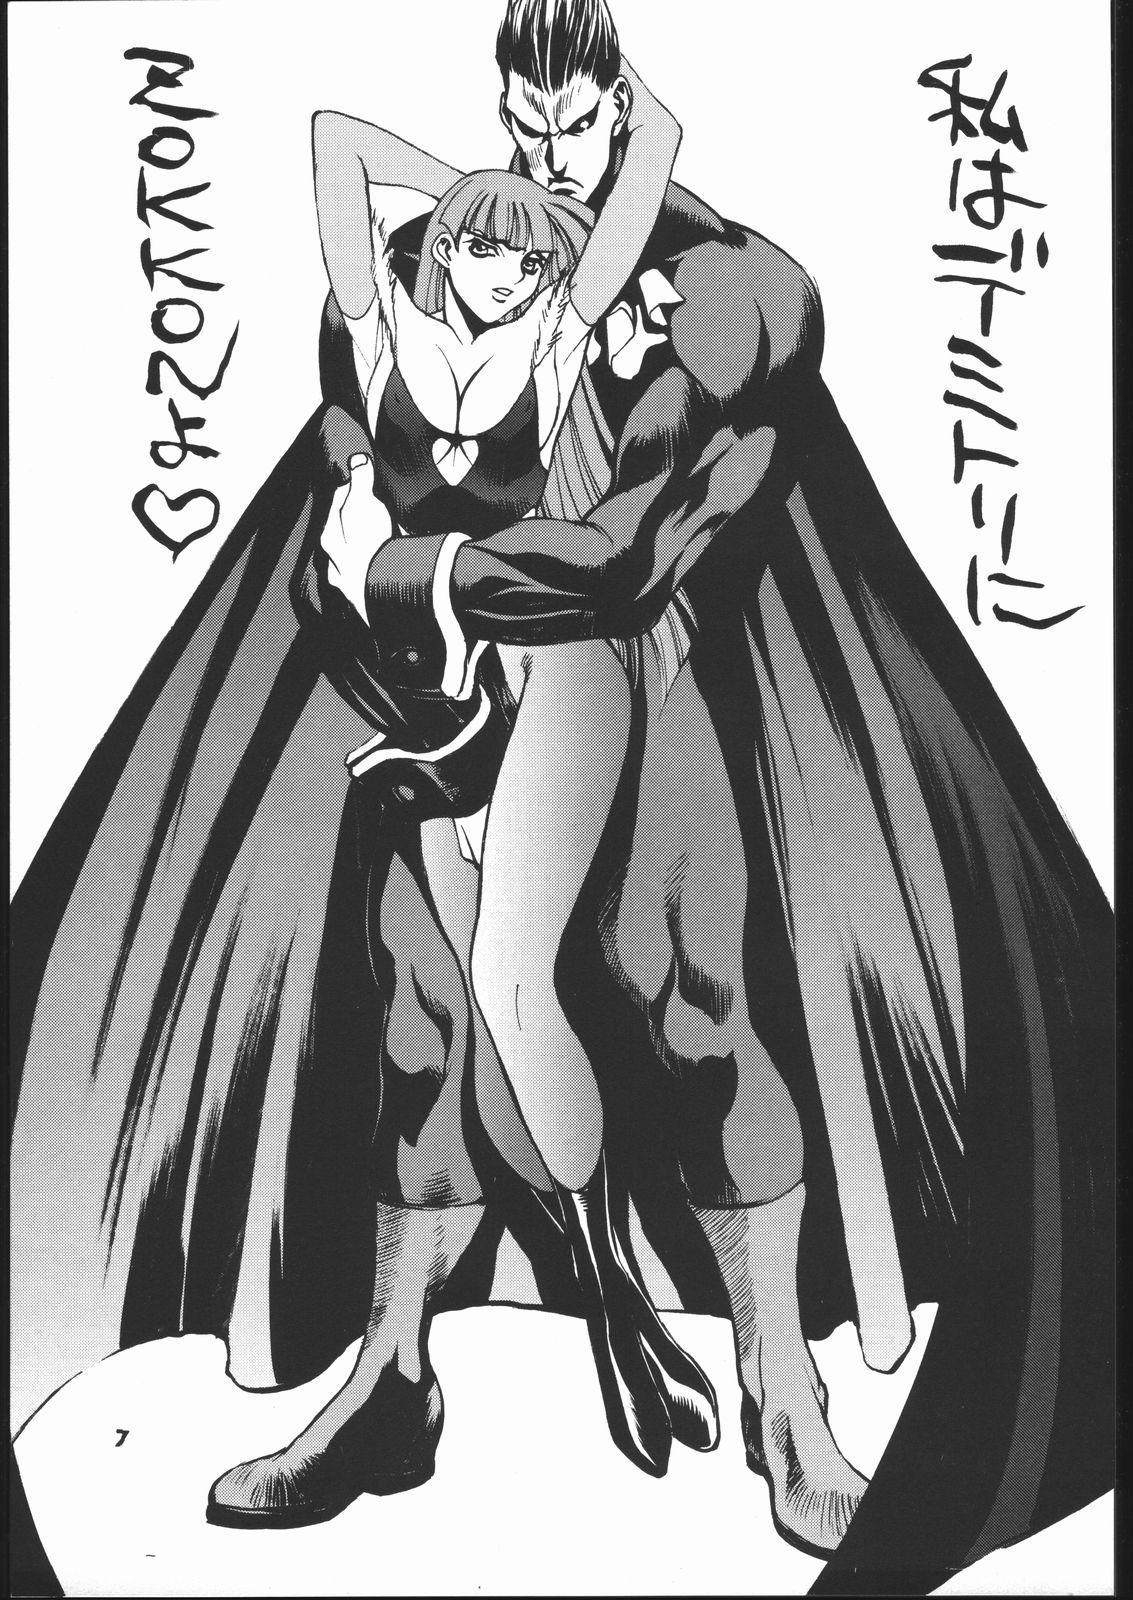 kakutou geemu hon 7